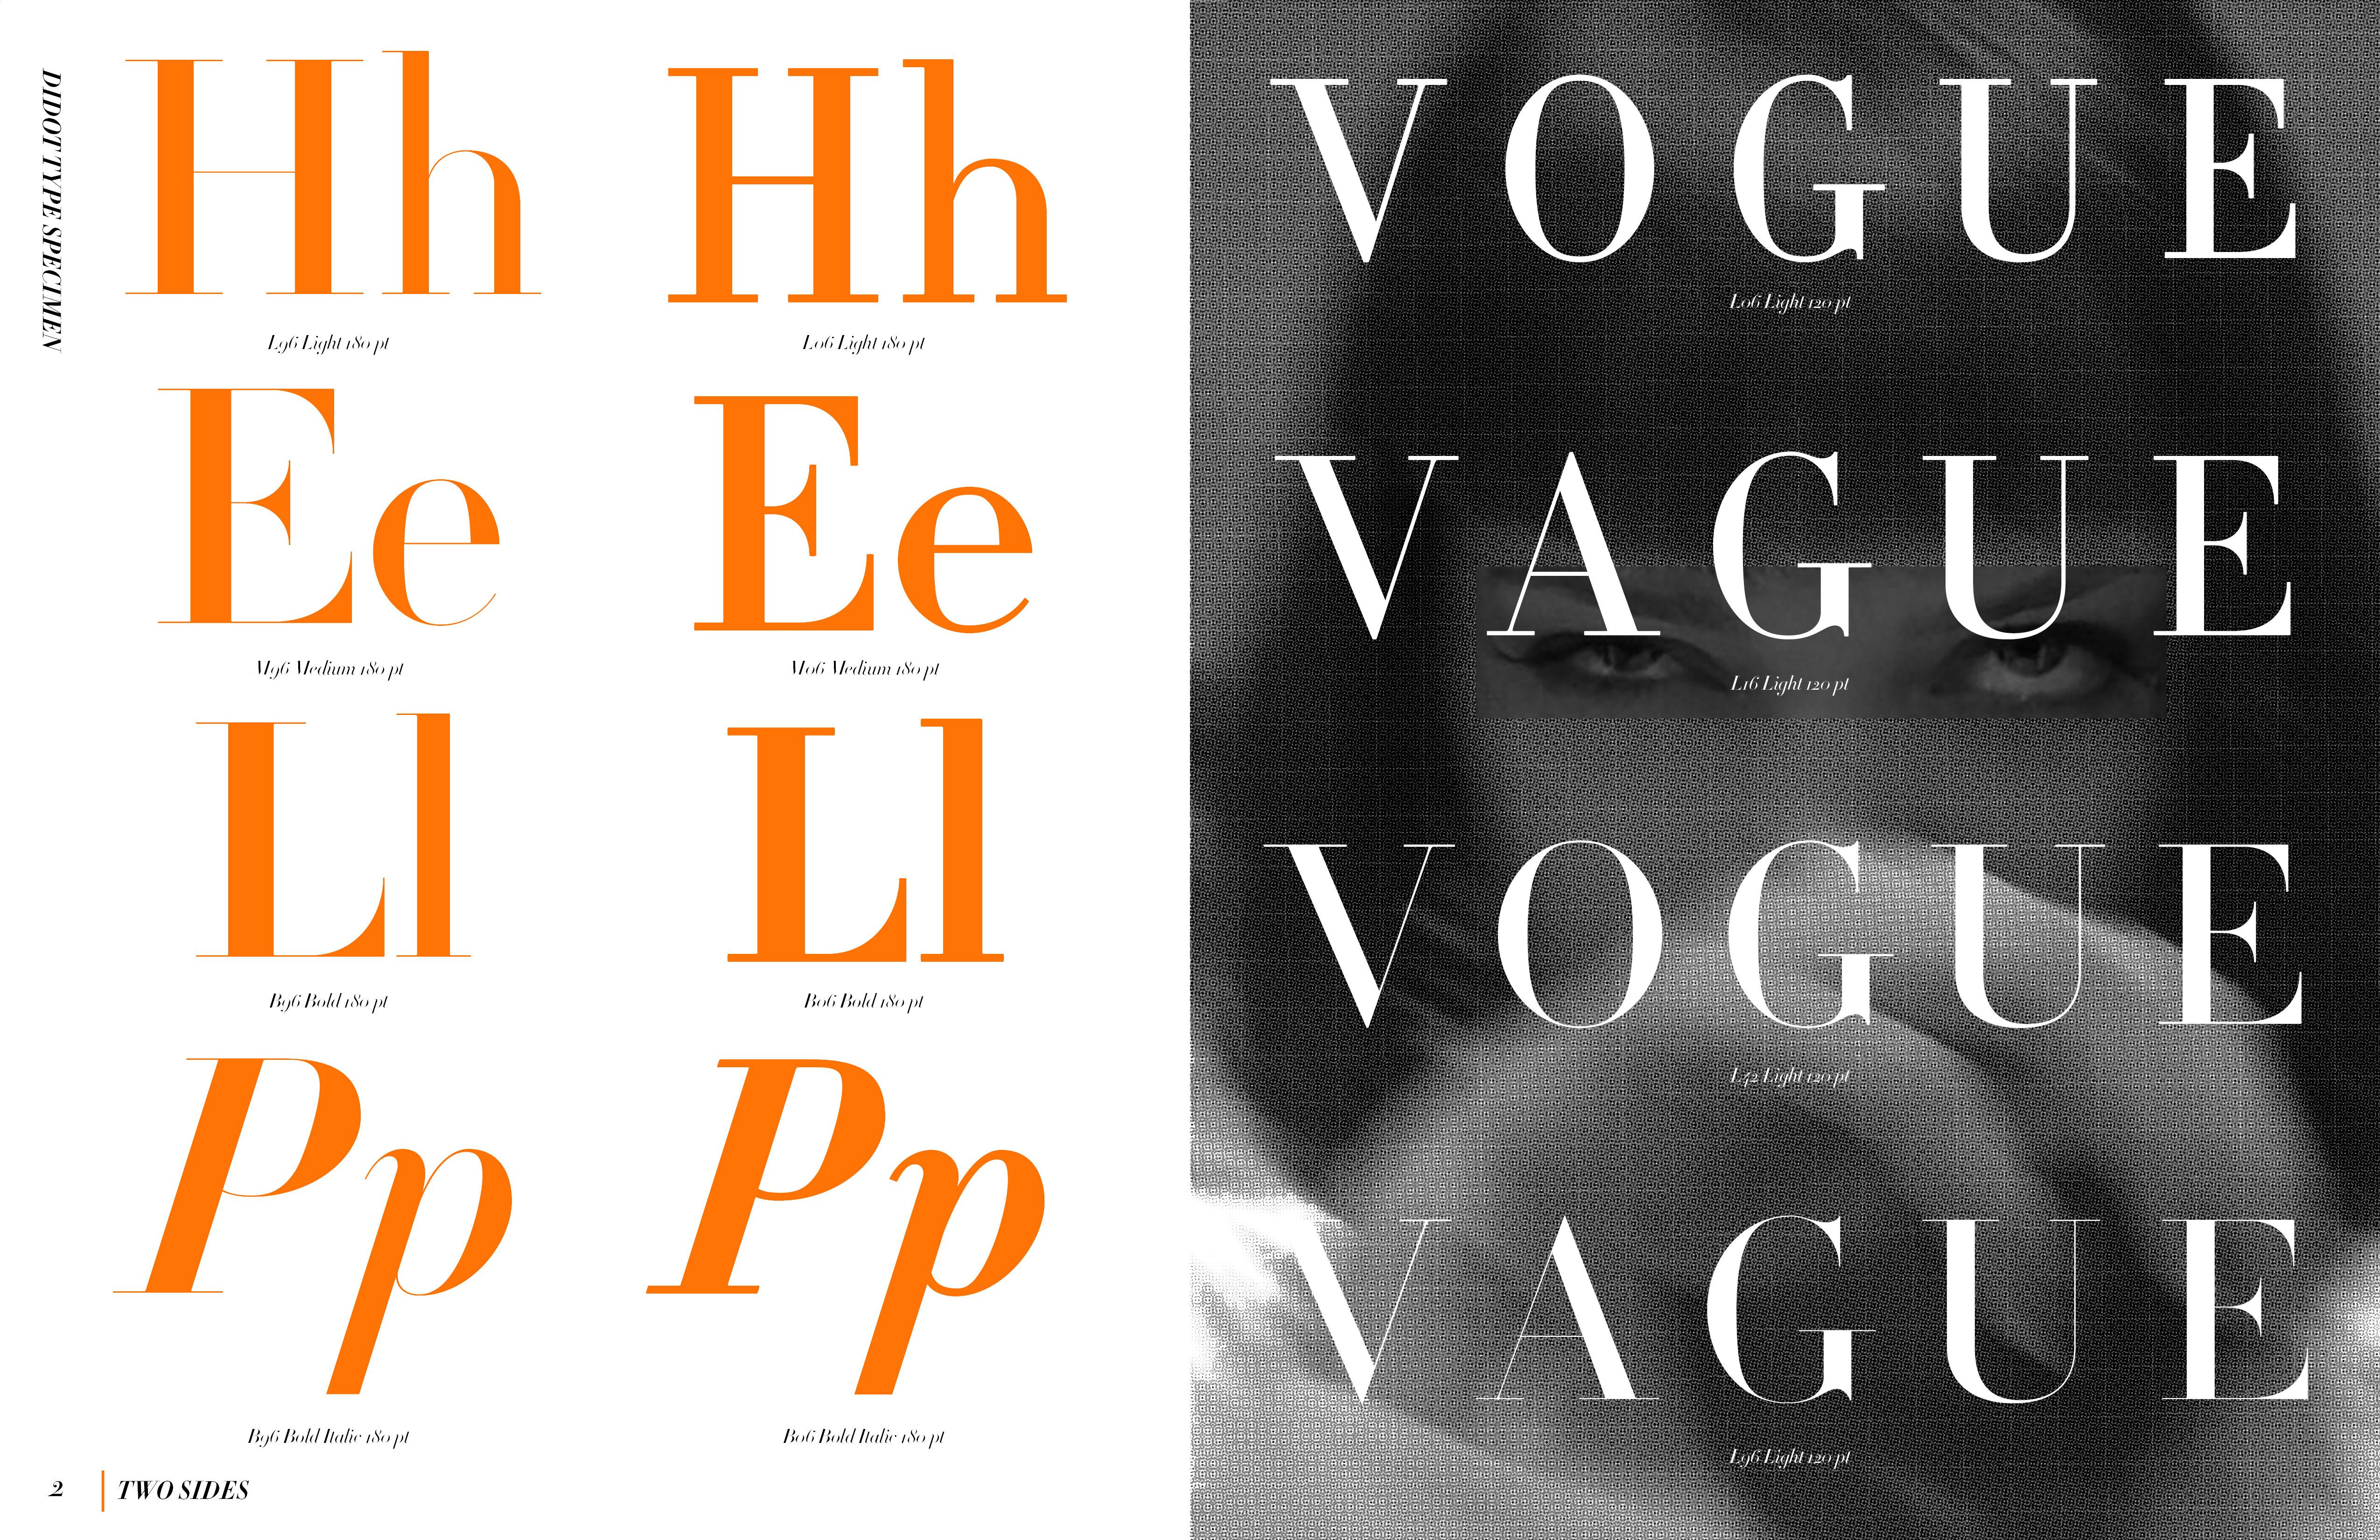 featured spread from type specimen